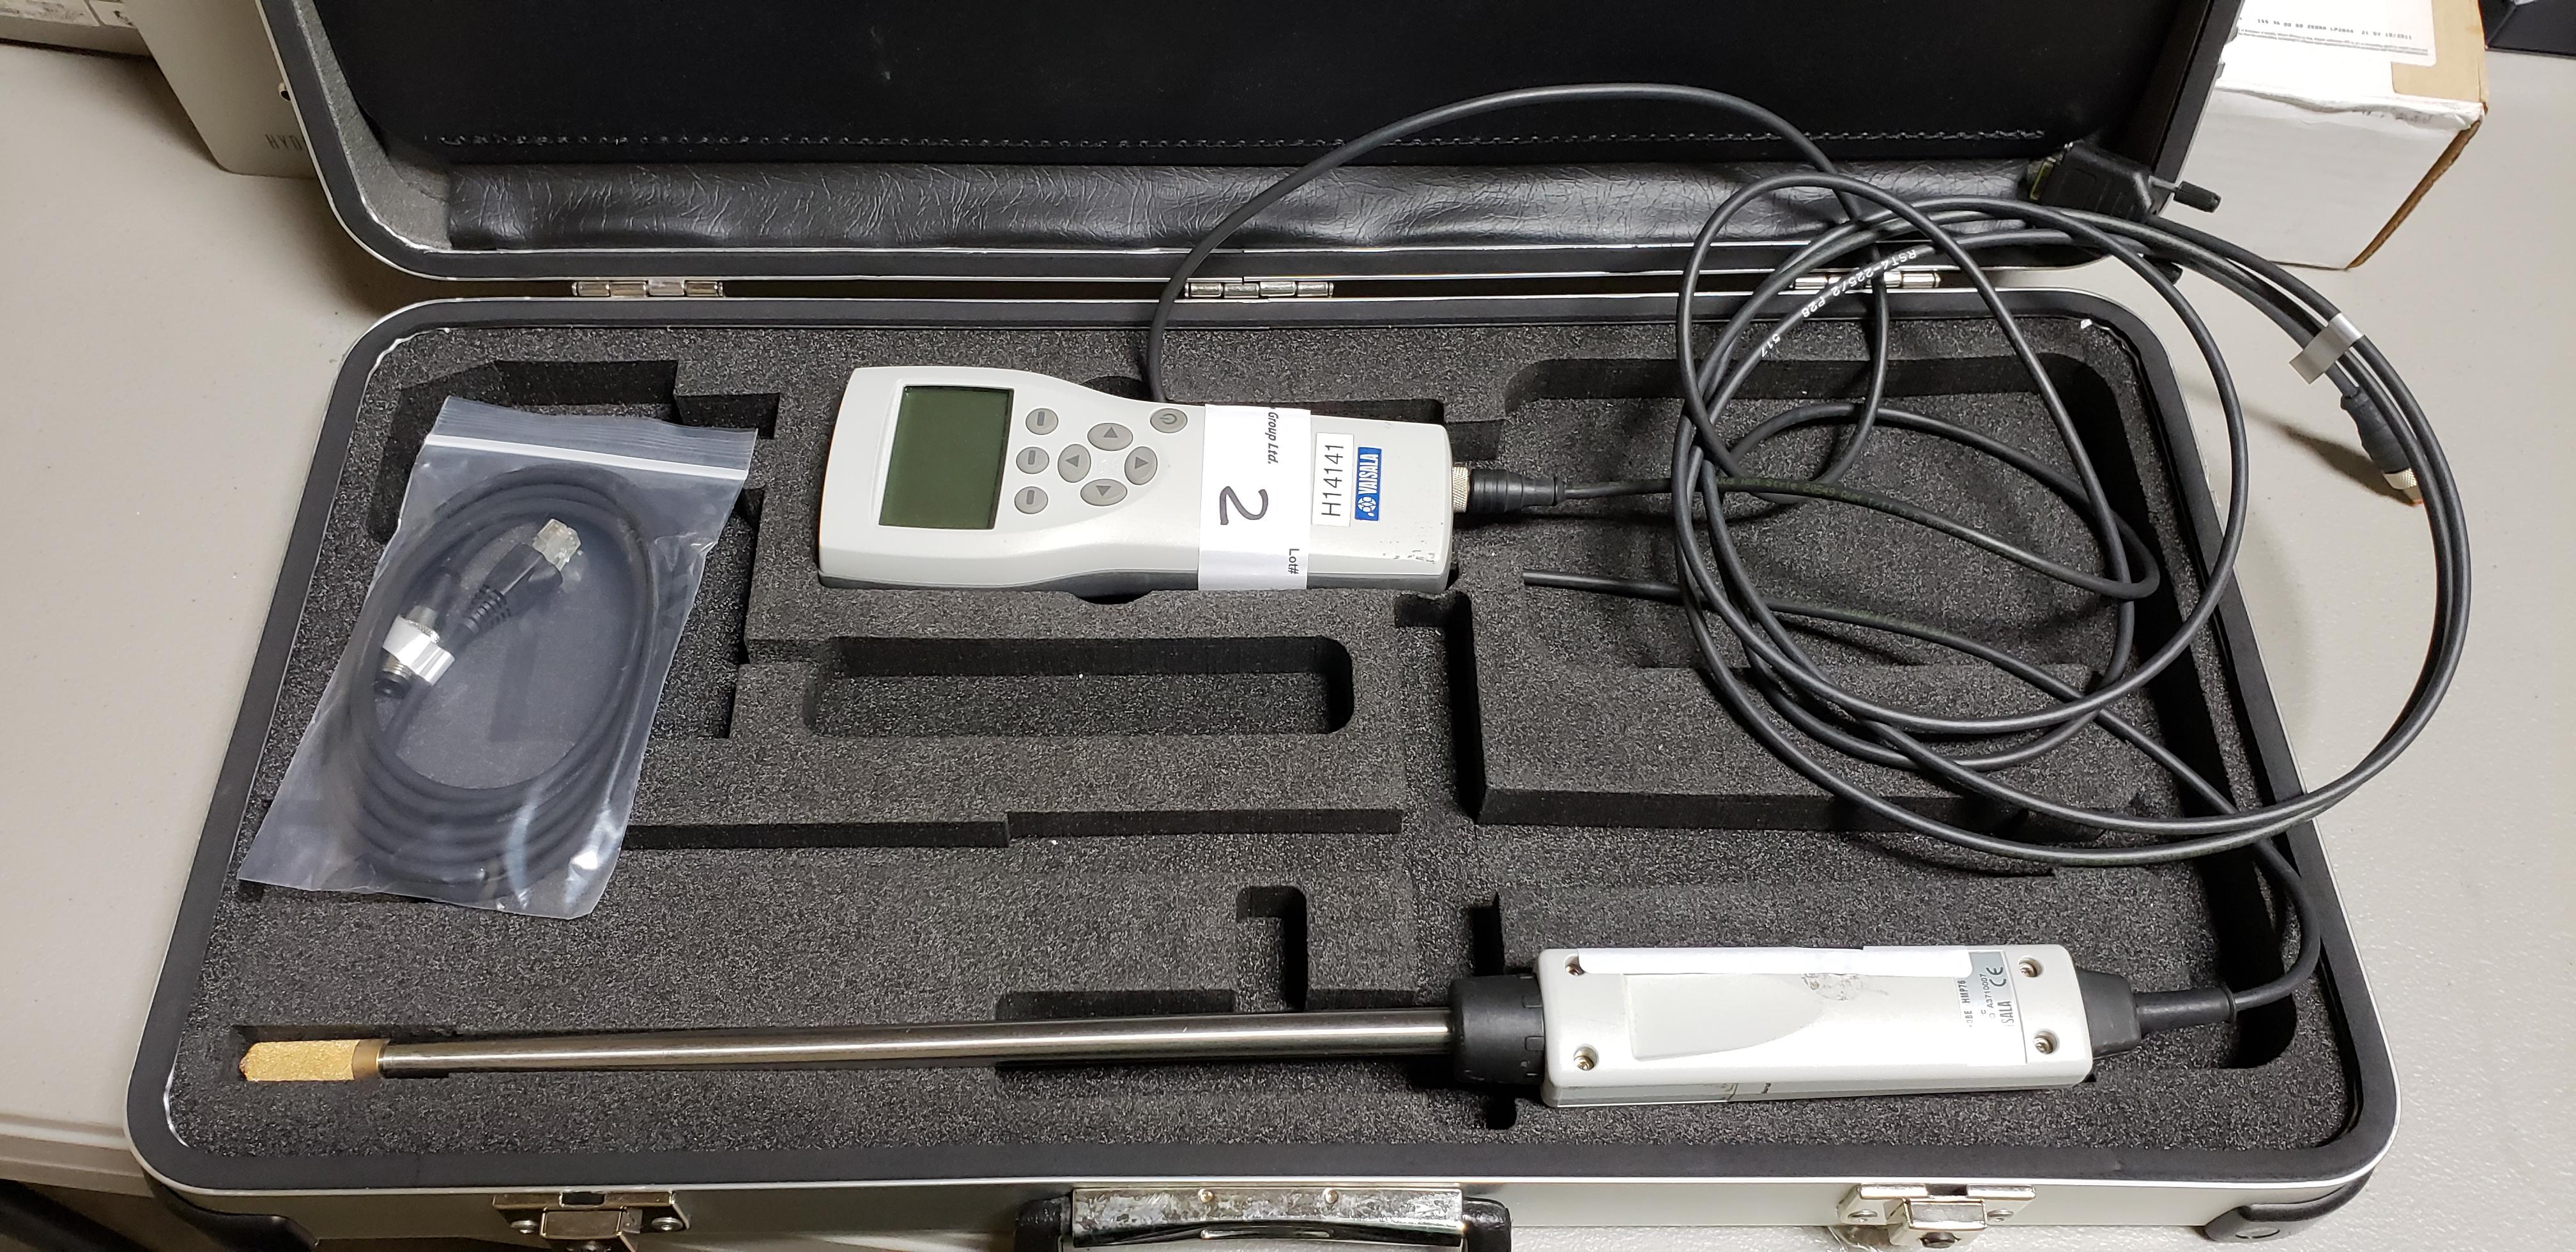 Lot 2 - VAISALA Measurement Indicator - Model MI 70